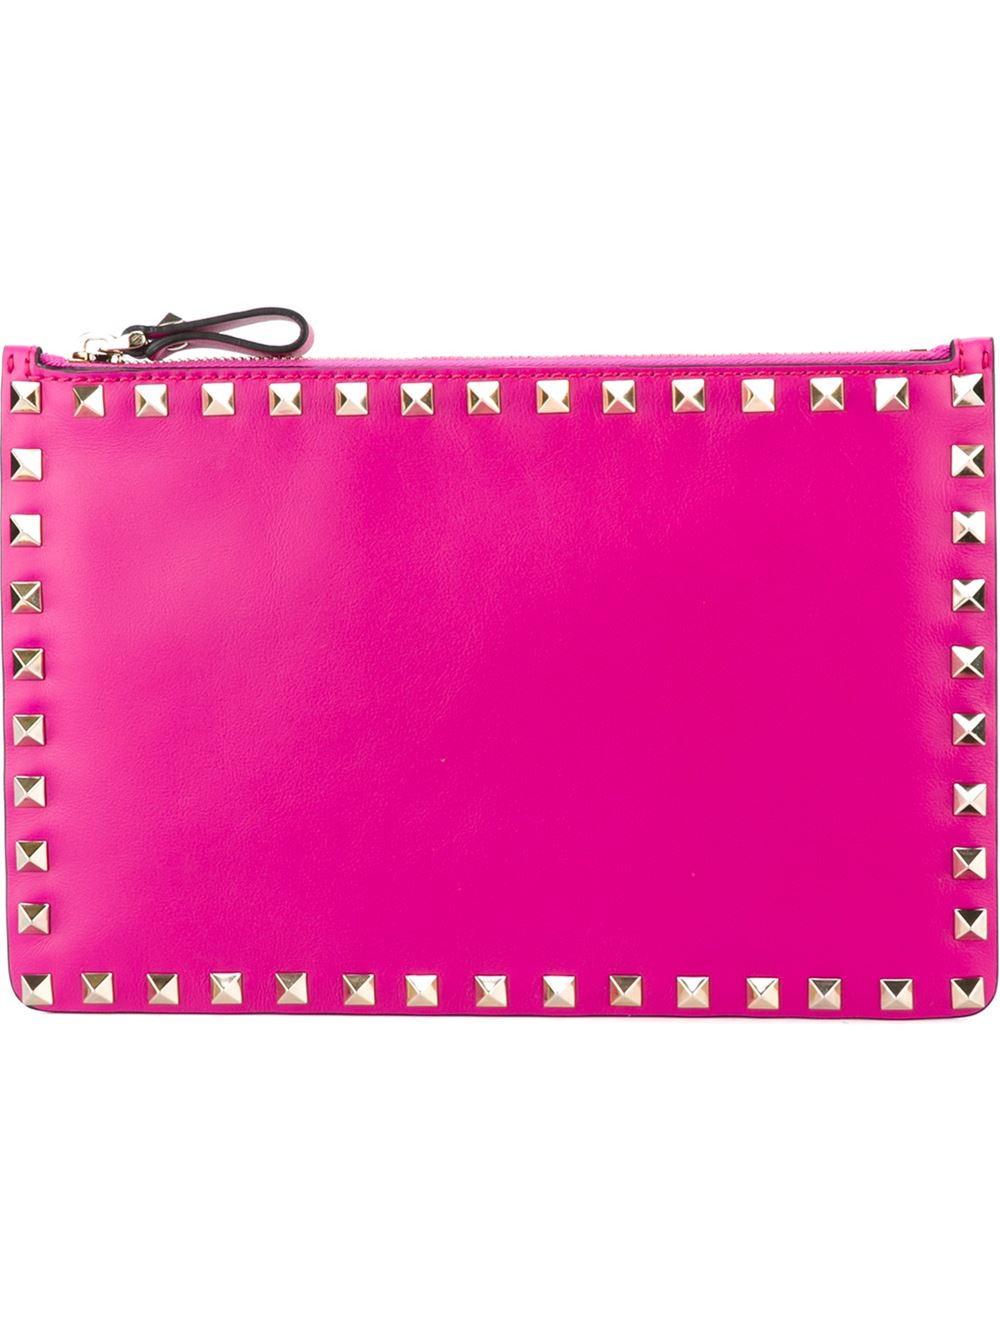 c2bcf481476 Valentino 'rockstud' Clutch in Pink - Lyst